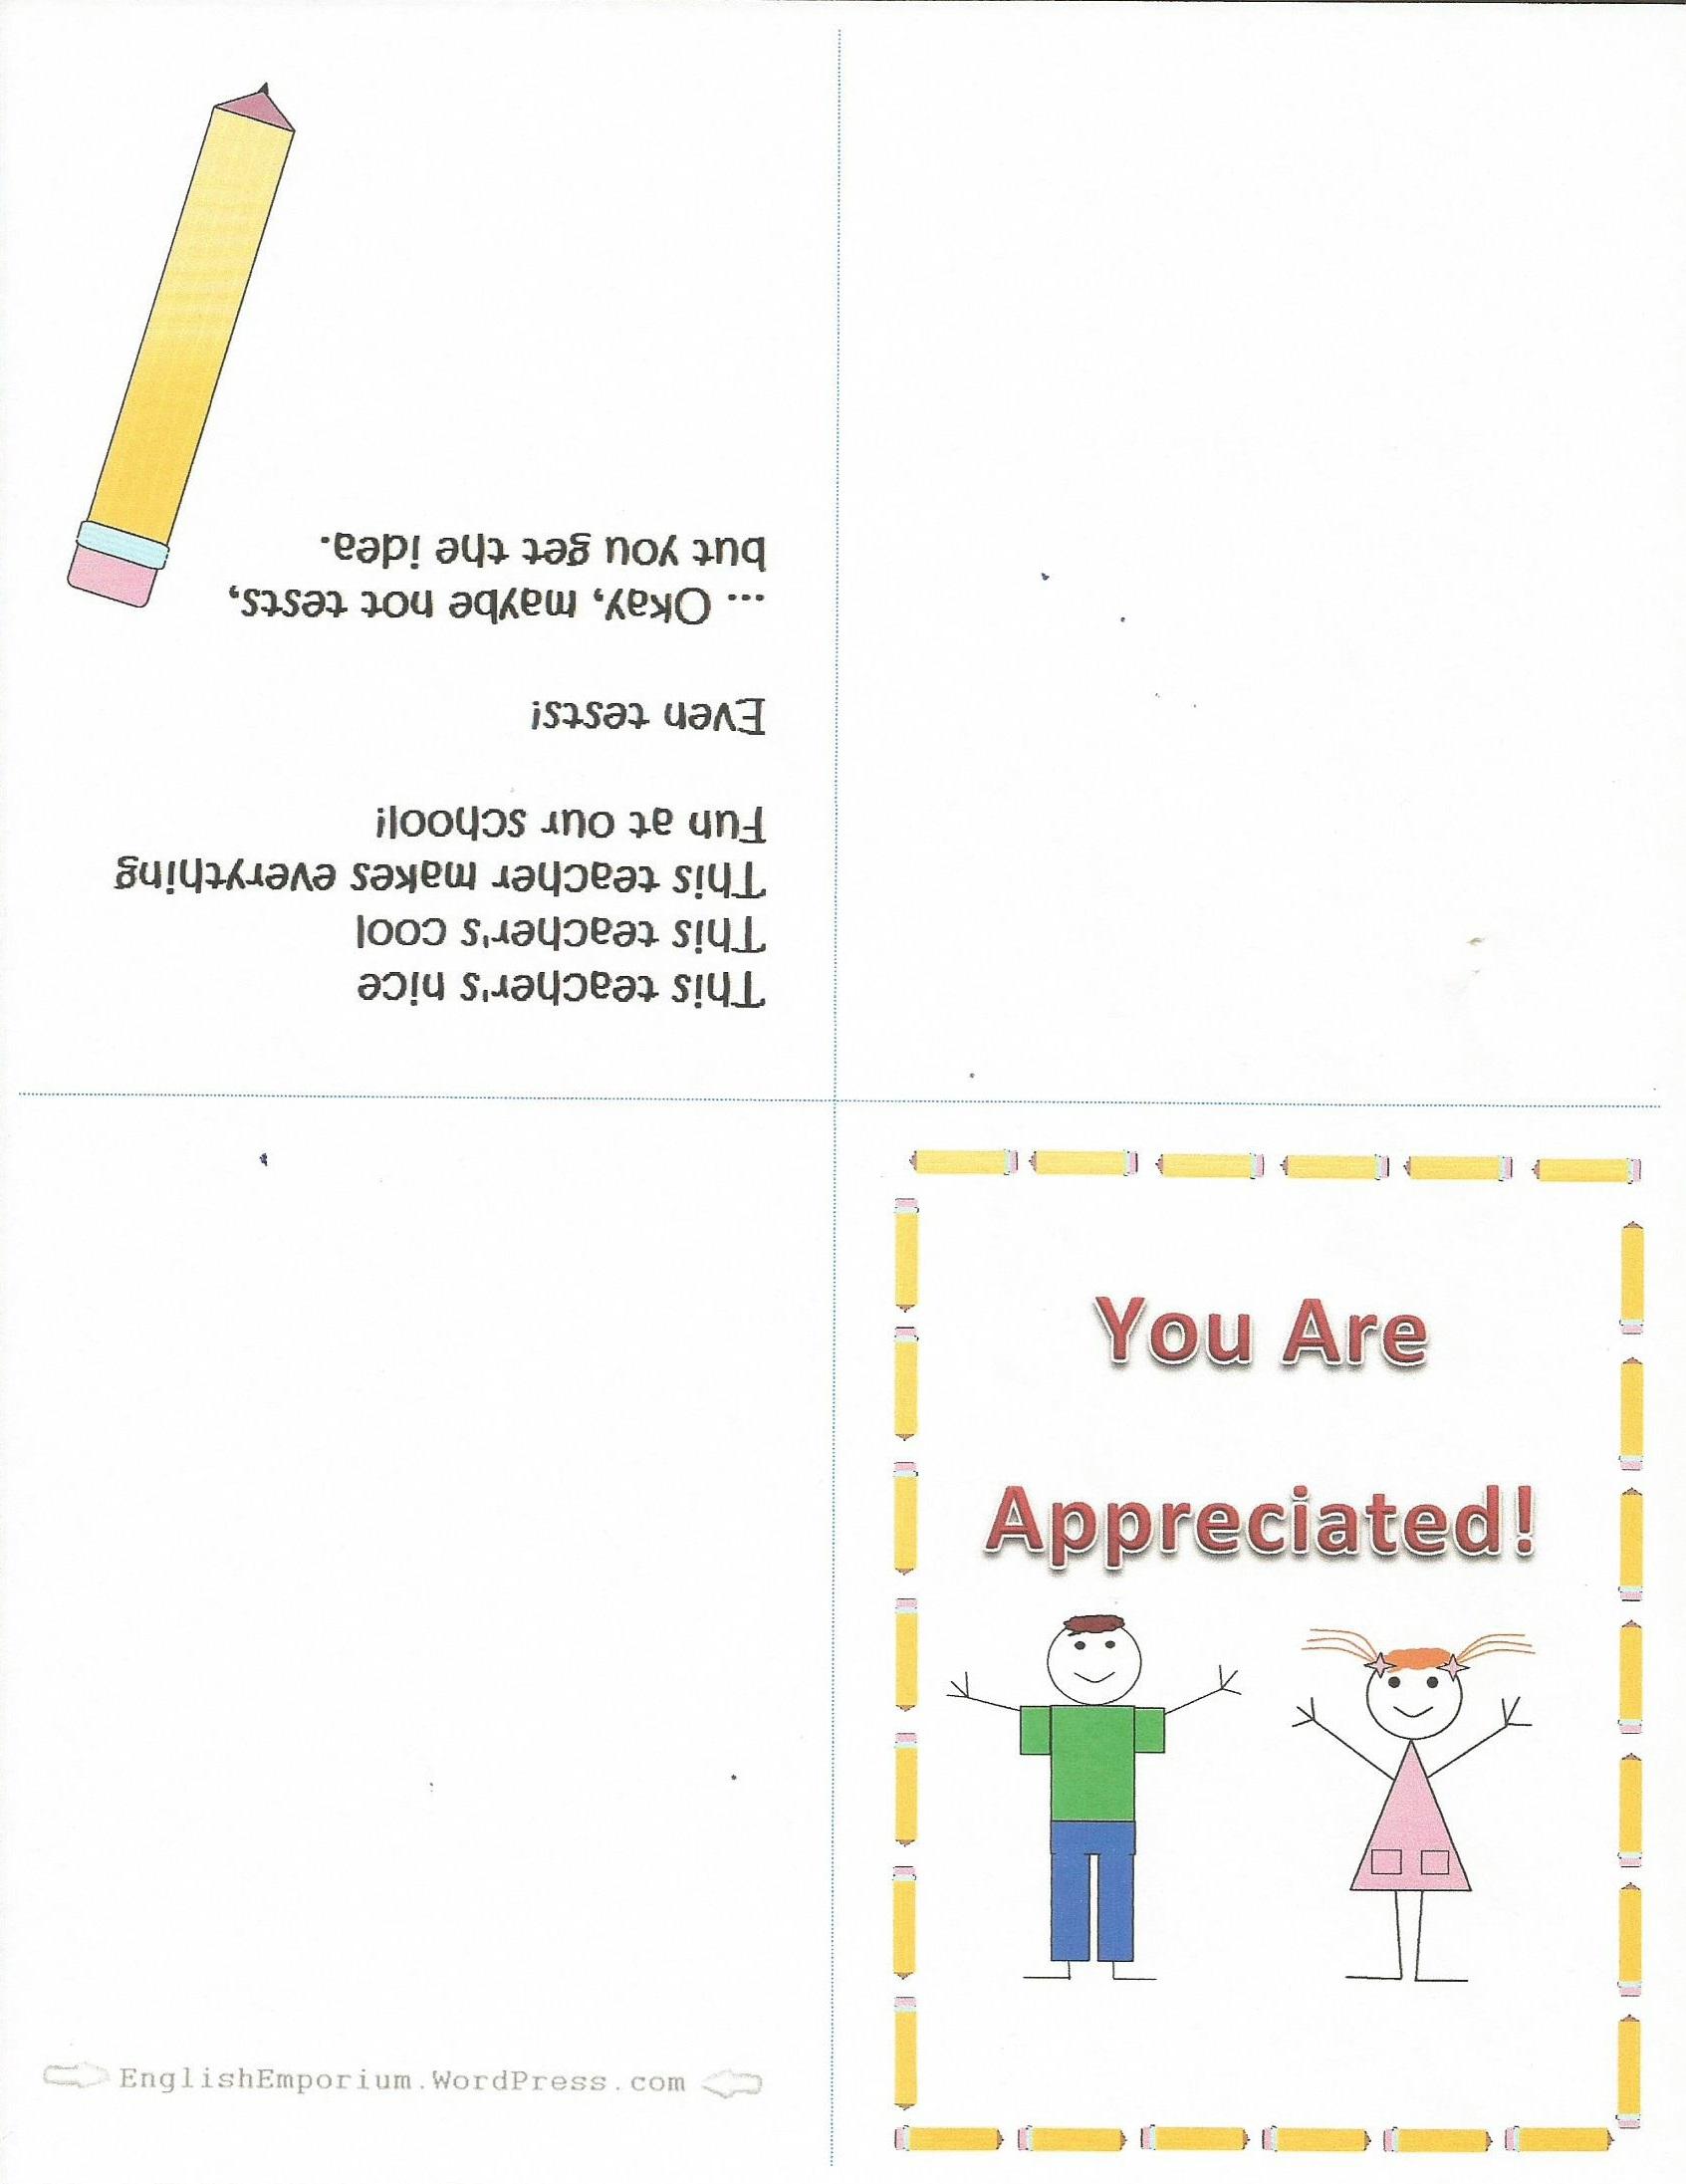 Free Printable Teacher Appreciation Card | Secret Pal Ideas From - Free Printable Teacher Appreciation Cards